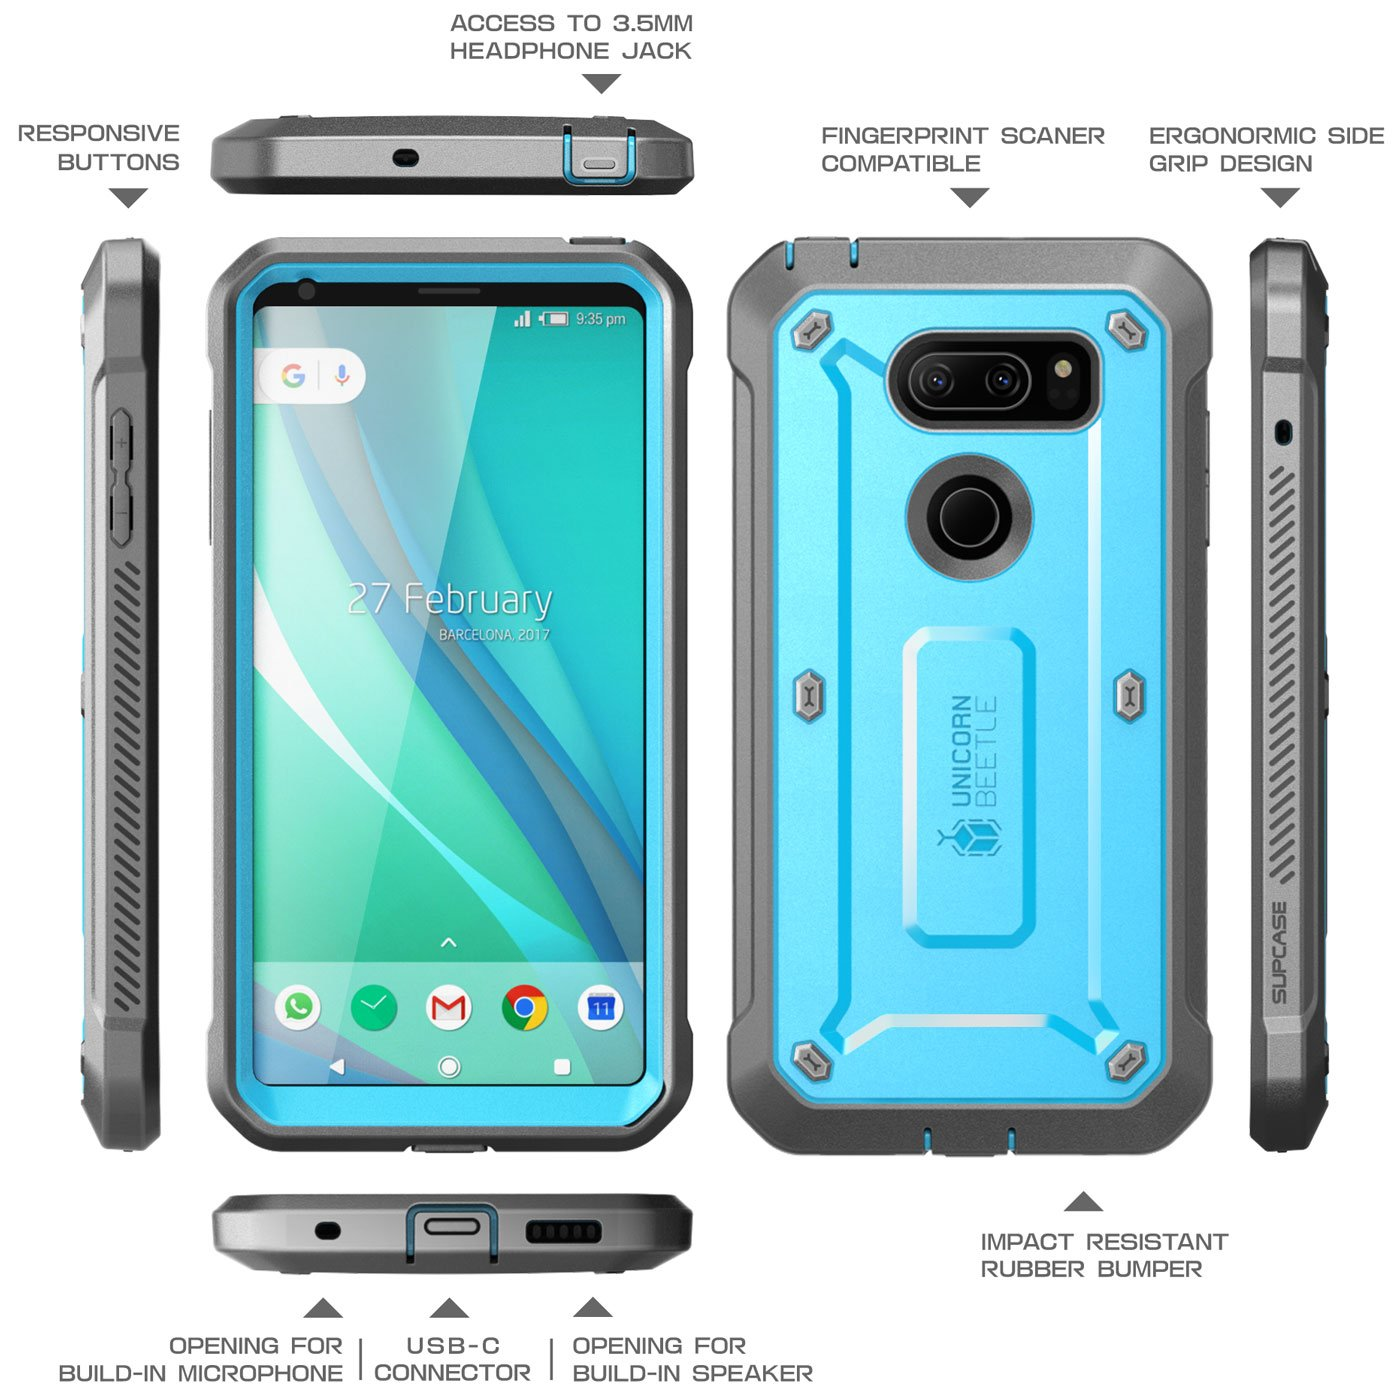 LG V30 Case, SUPCASE Full-body Rugged Holster Case with Built-in Screen Protector for LG V30, LG V30s,LG V35,LG V35 ThinQ,LG V30 Plus 2017 Release, Unicorn Beetle PRO Series(Blue/Gray) by SUPCASE (Image #3)